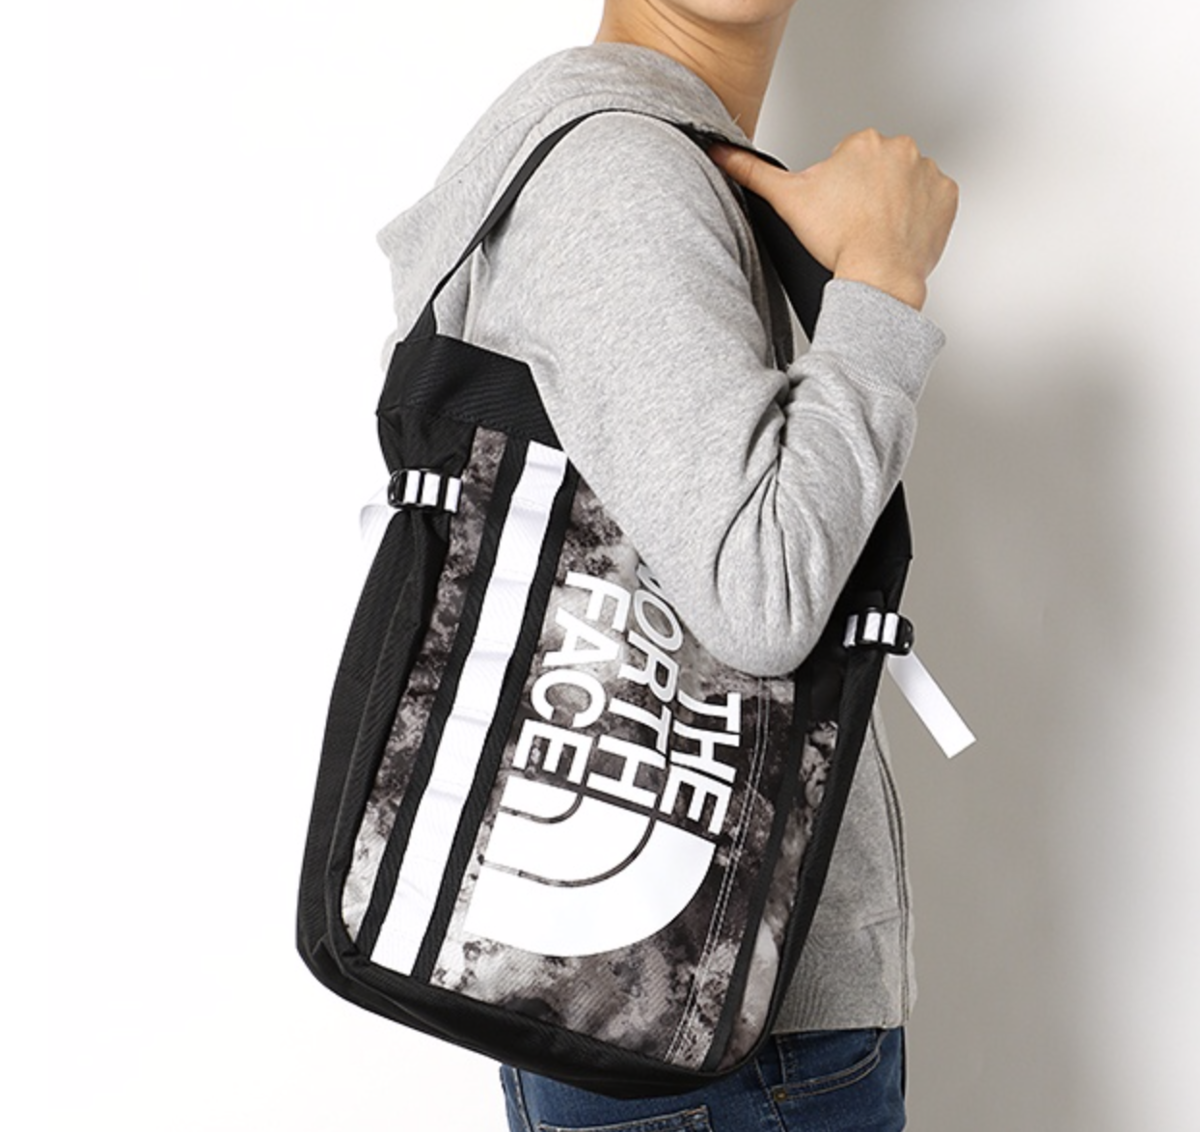 f:id:thebackpack:20190406091703p:plain